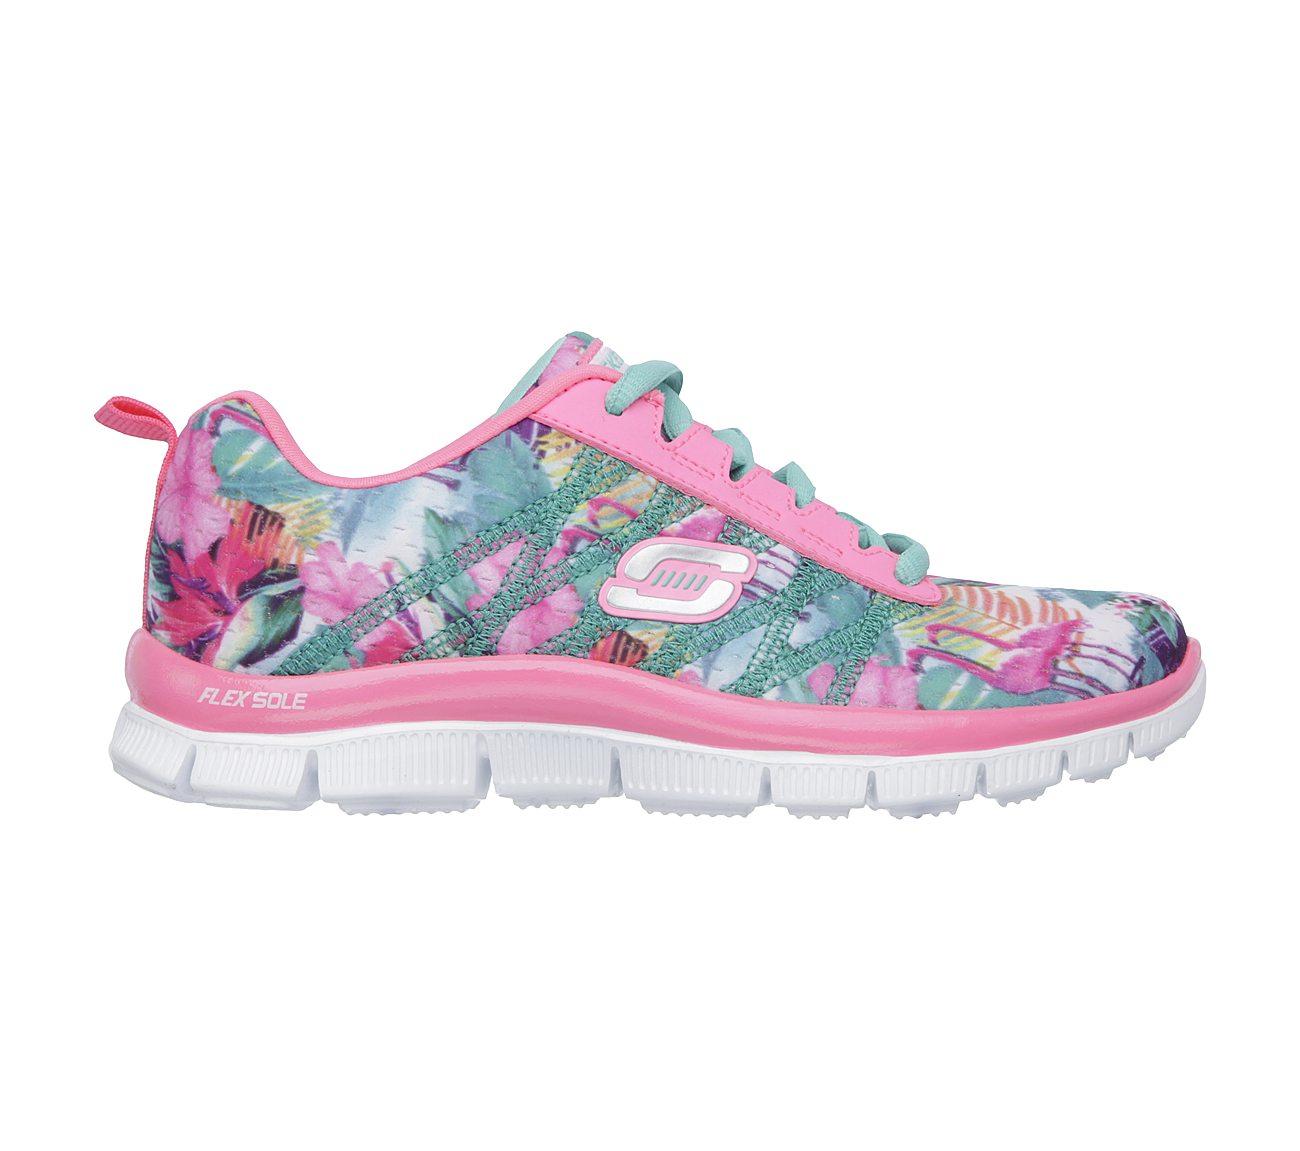 c64f2d87c059 Buy SKECHERS Skech Appeal - Floral Bloom Sport Shoes only  37.00